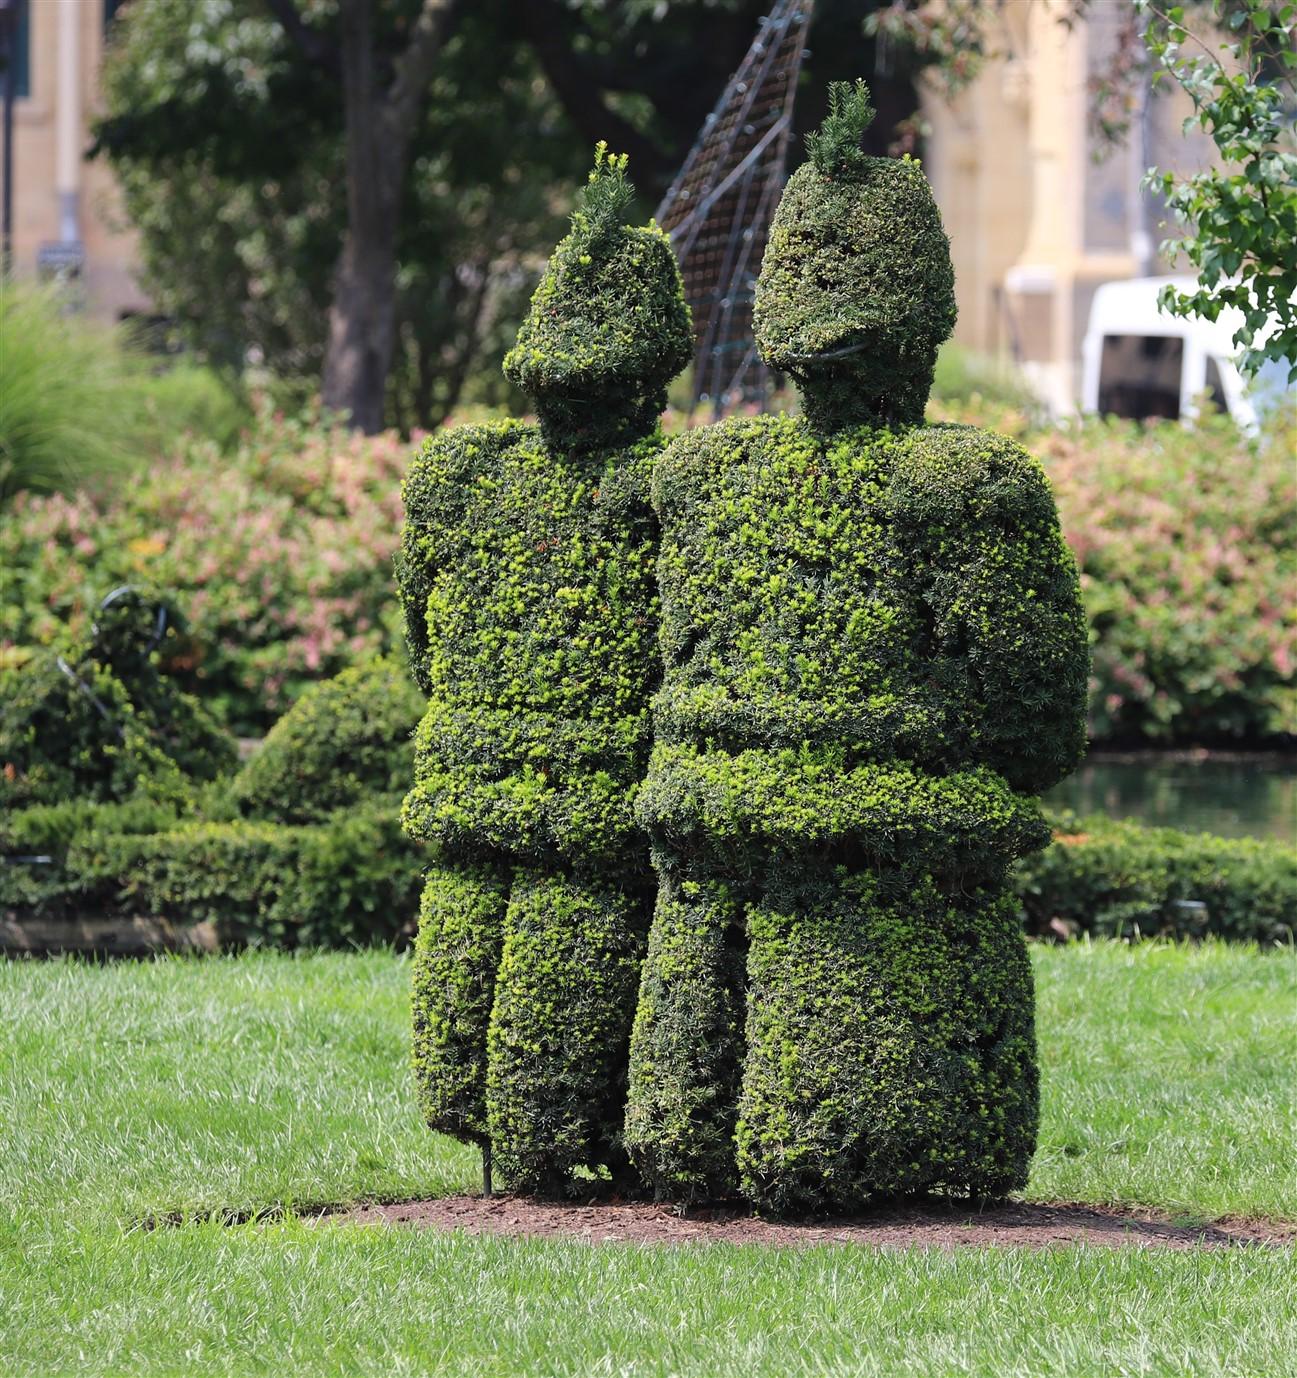 2018 08 26 105 Columbus Topiary Park.jpg